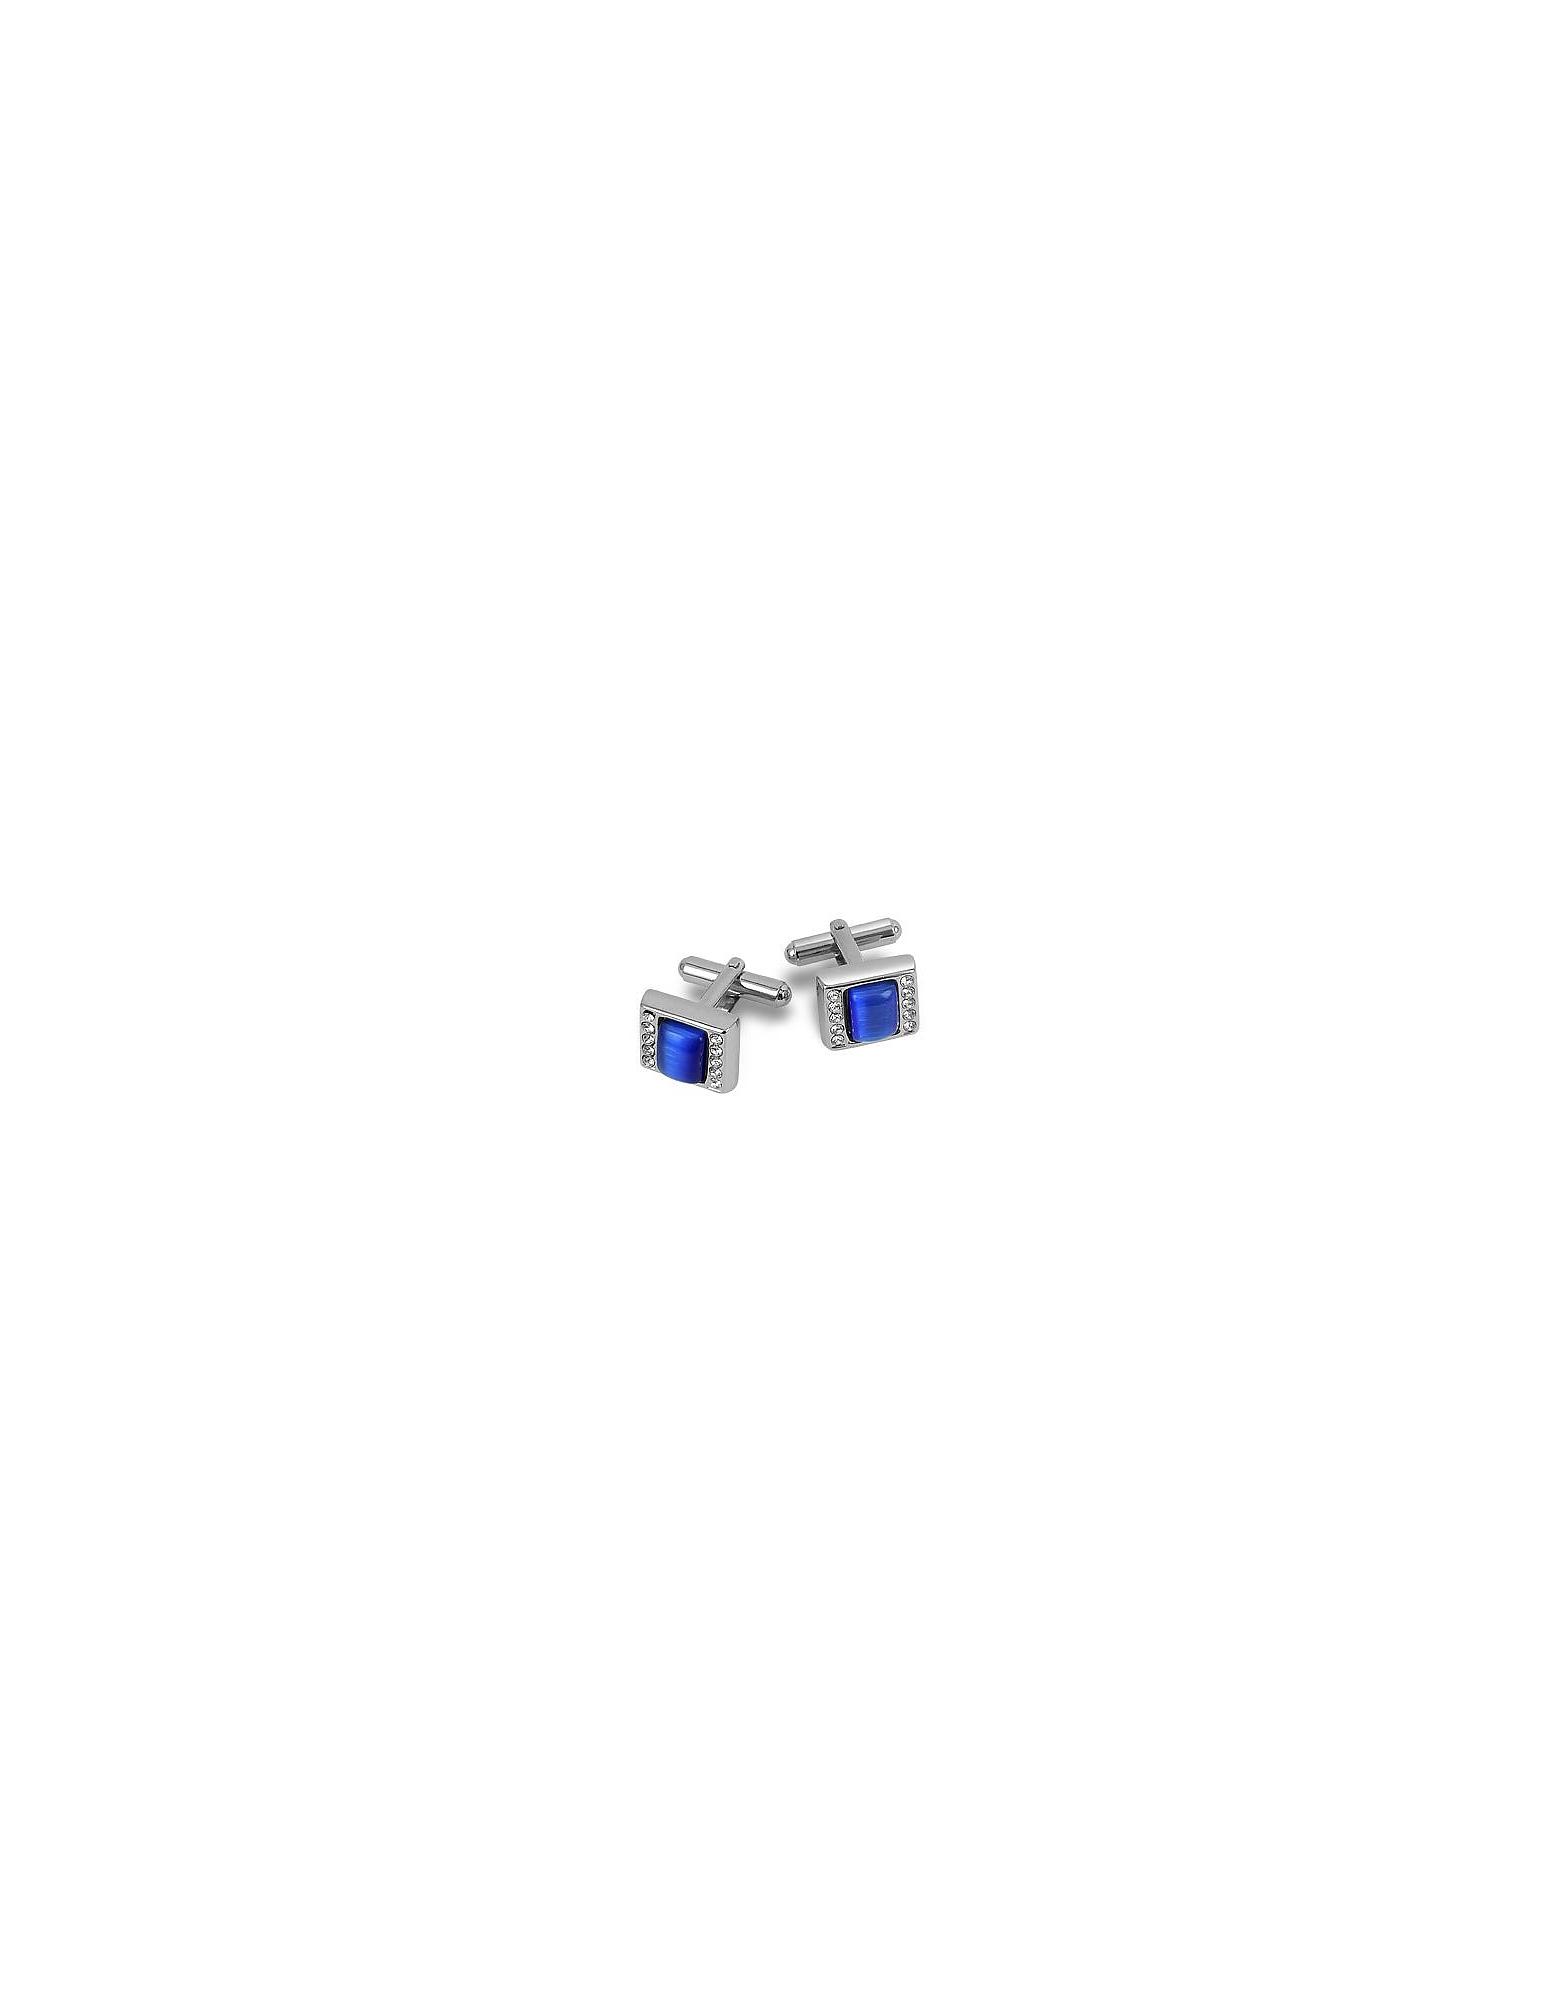 Forzieri Designer Cufflinks, Blue Square Cufflinks